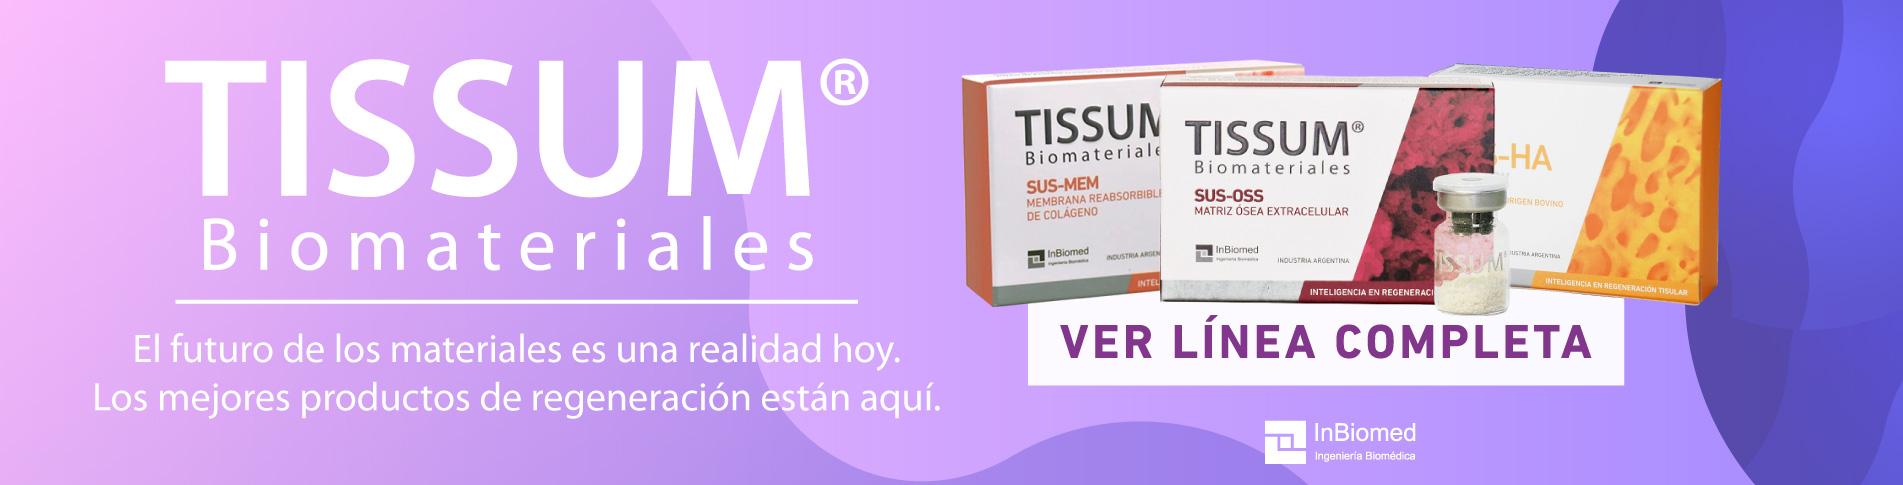 Tissum